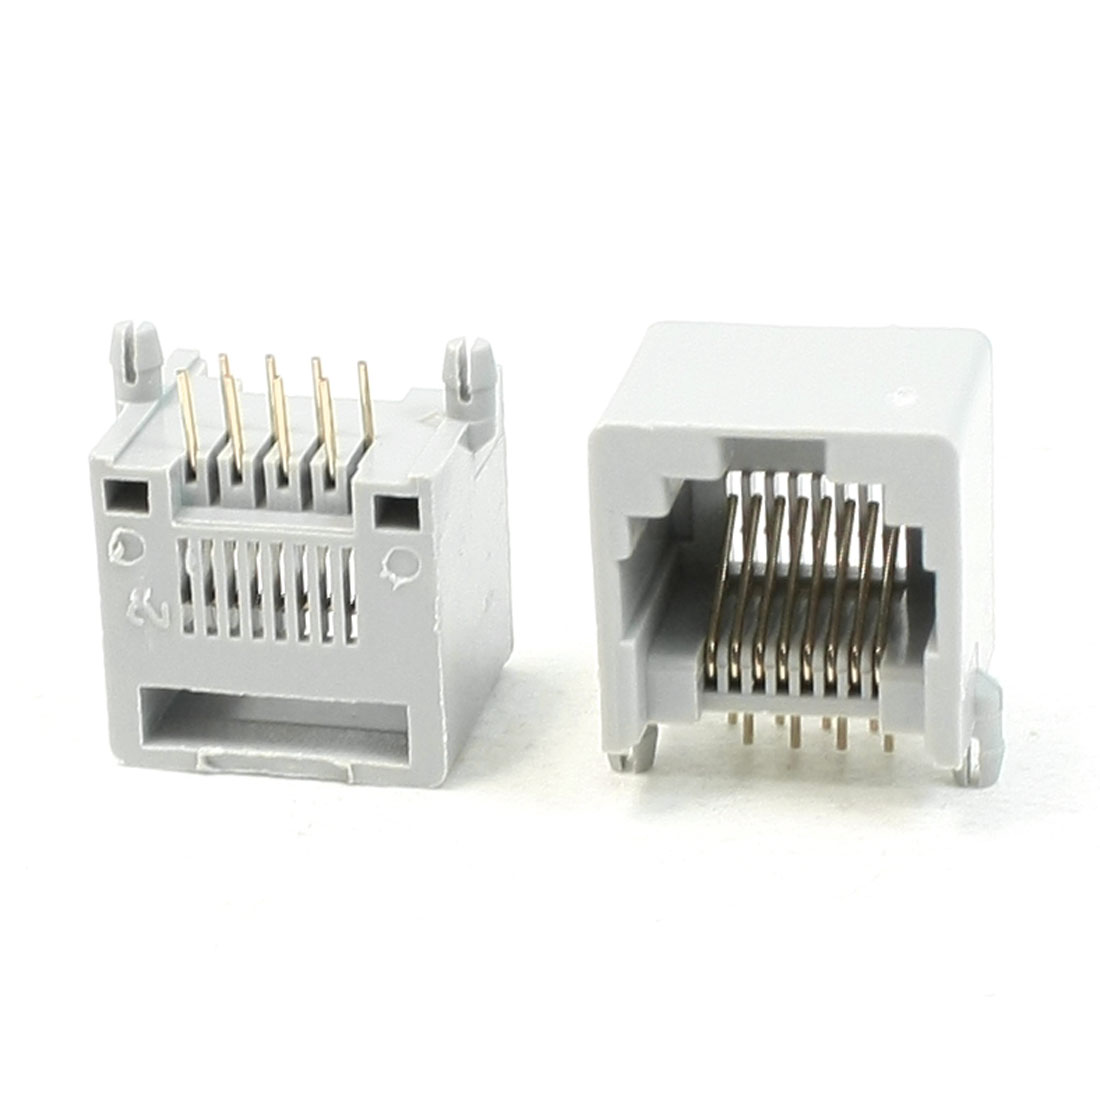 Right Angle Pins RJ45 8P8C PCB Jacks Sockets 13x15x14.5mm 20Pcs for Ethernet